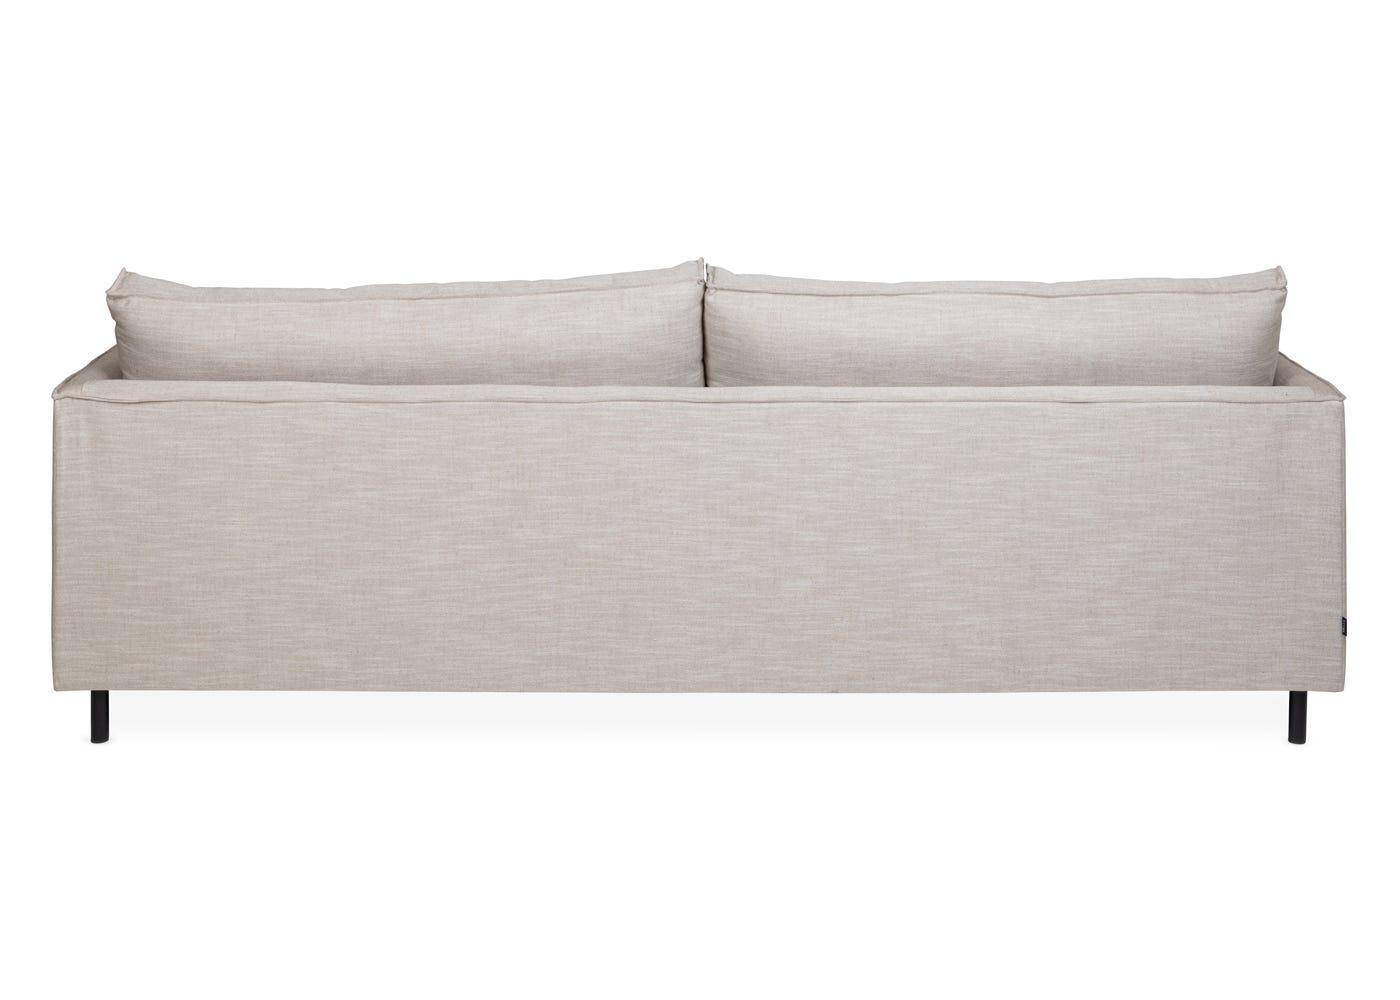 Tortona 4 Seater Sofa in Broad Weave Putty - Rear